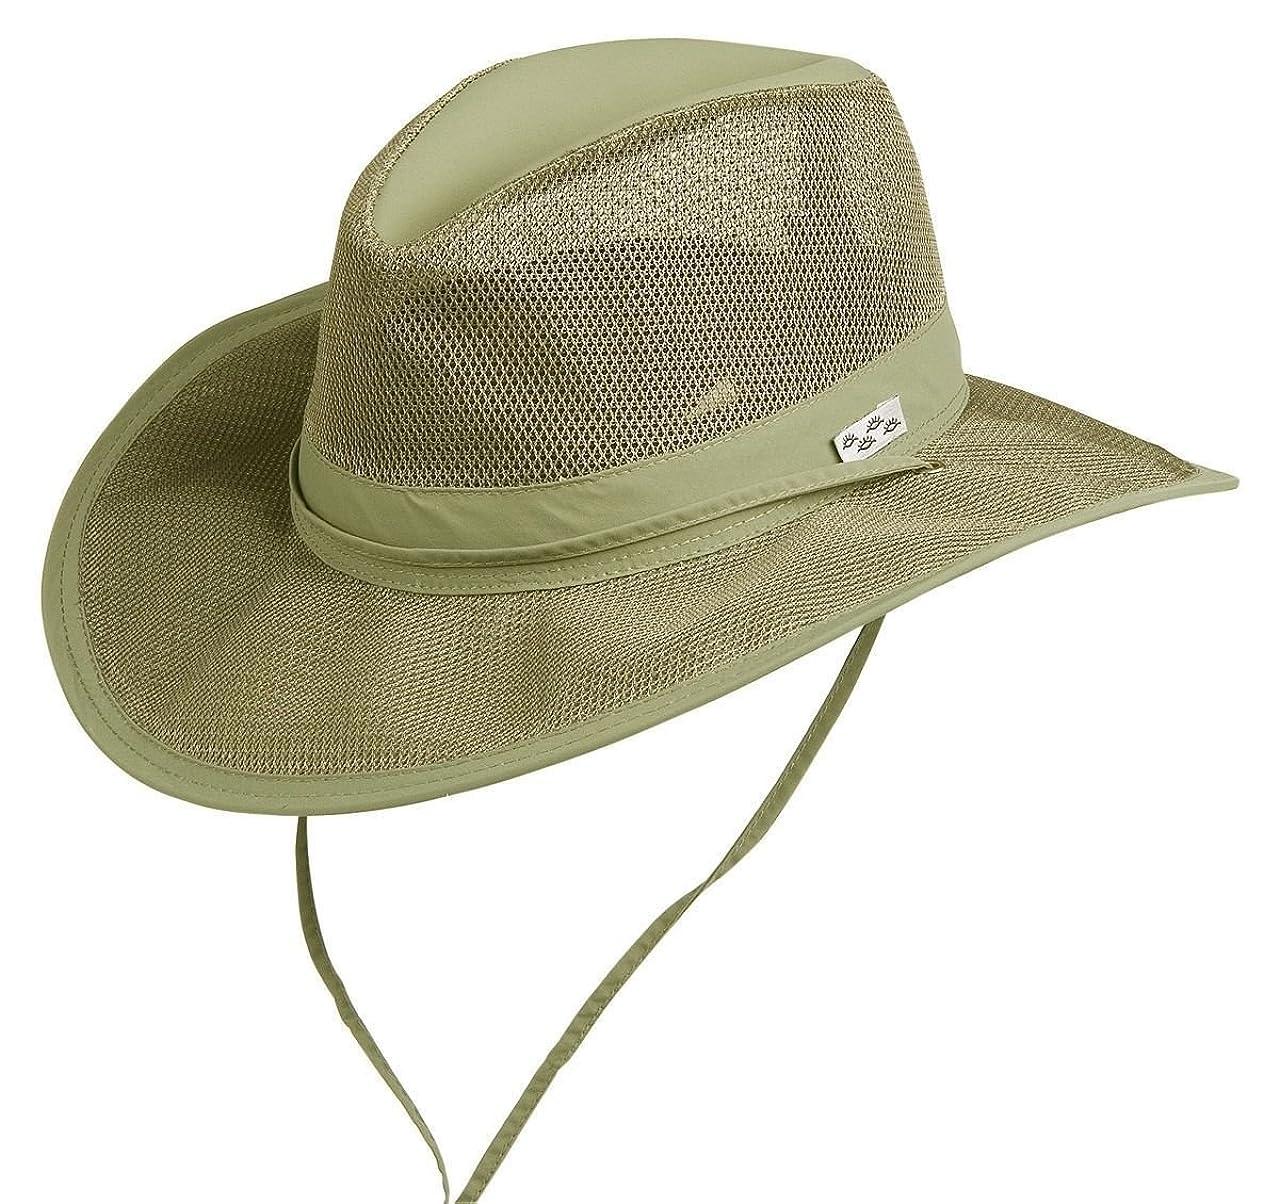 Conner Hats Men's Airflow Light Weight Supplex Outdoor Hat